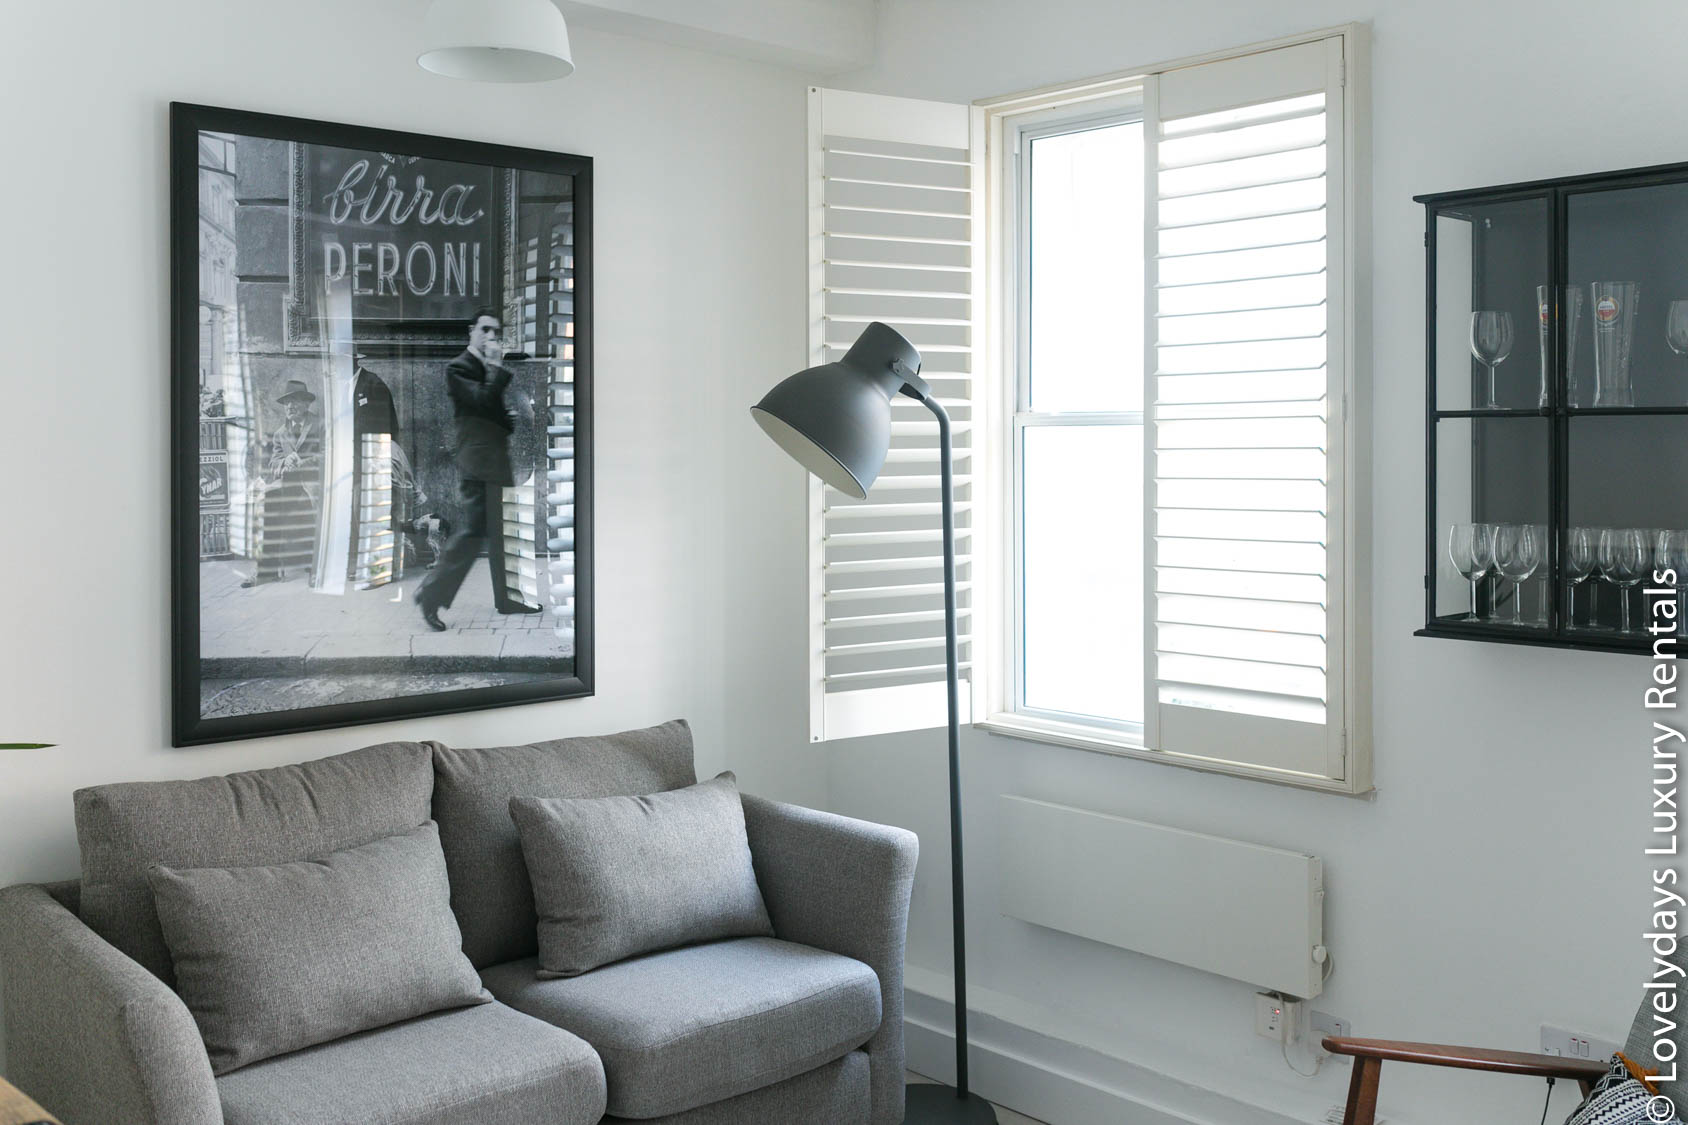 Lovelydays luxury service apartment rental - London - Fitzrovia - Goodge 55 - Lovelysuite - 2 bedrooms - 3 bathrooms - Comfortable sofa - 41a16faab2df - Lovelydays